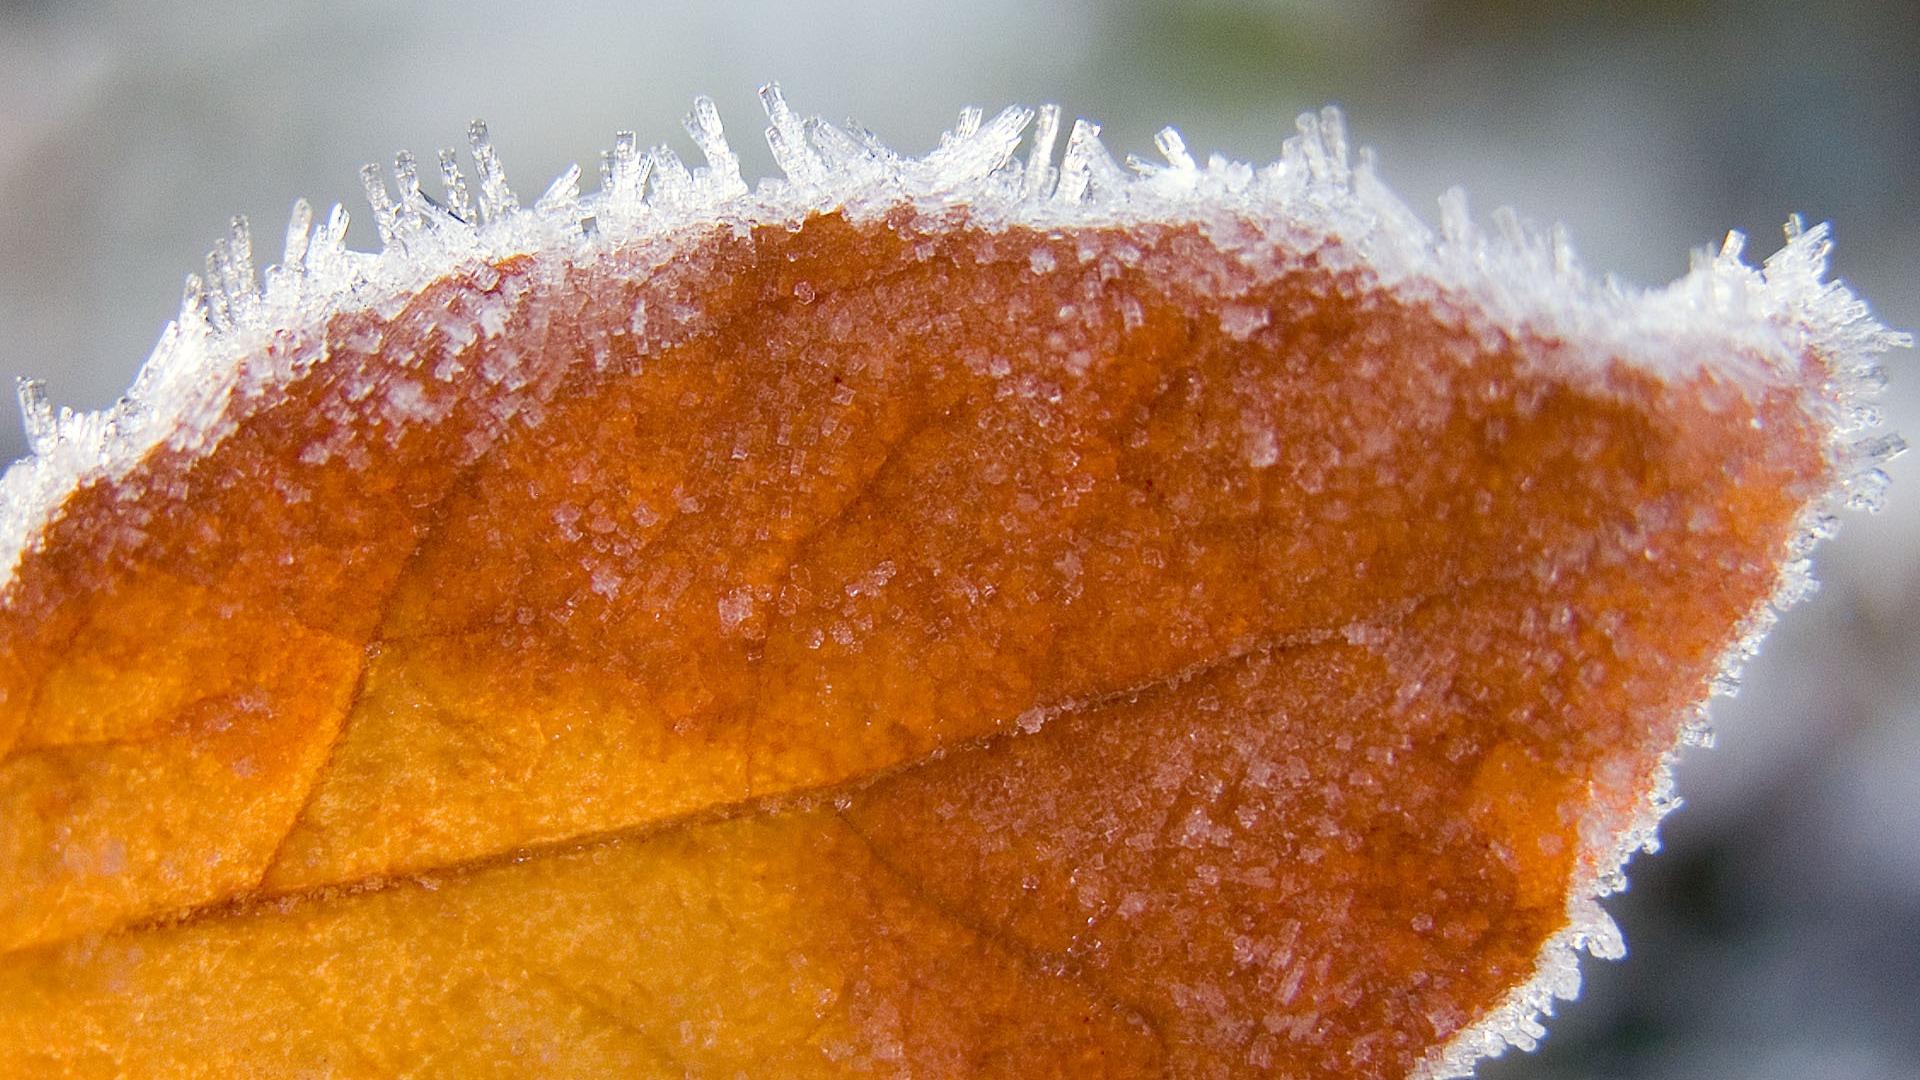 frost wallpaper autumn leaf